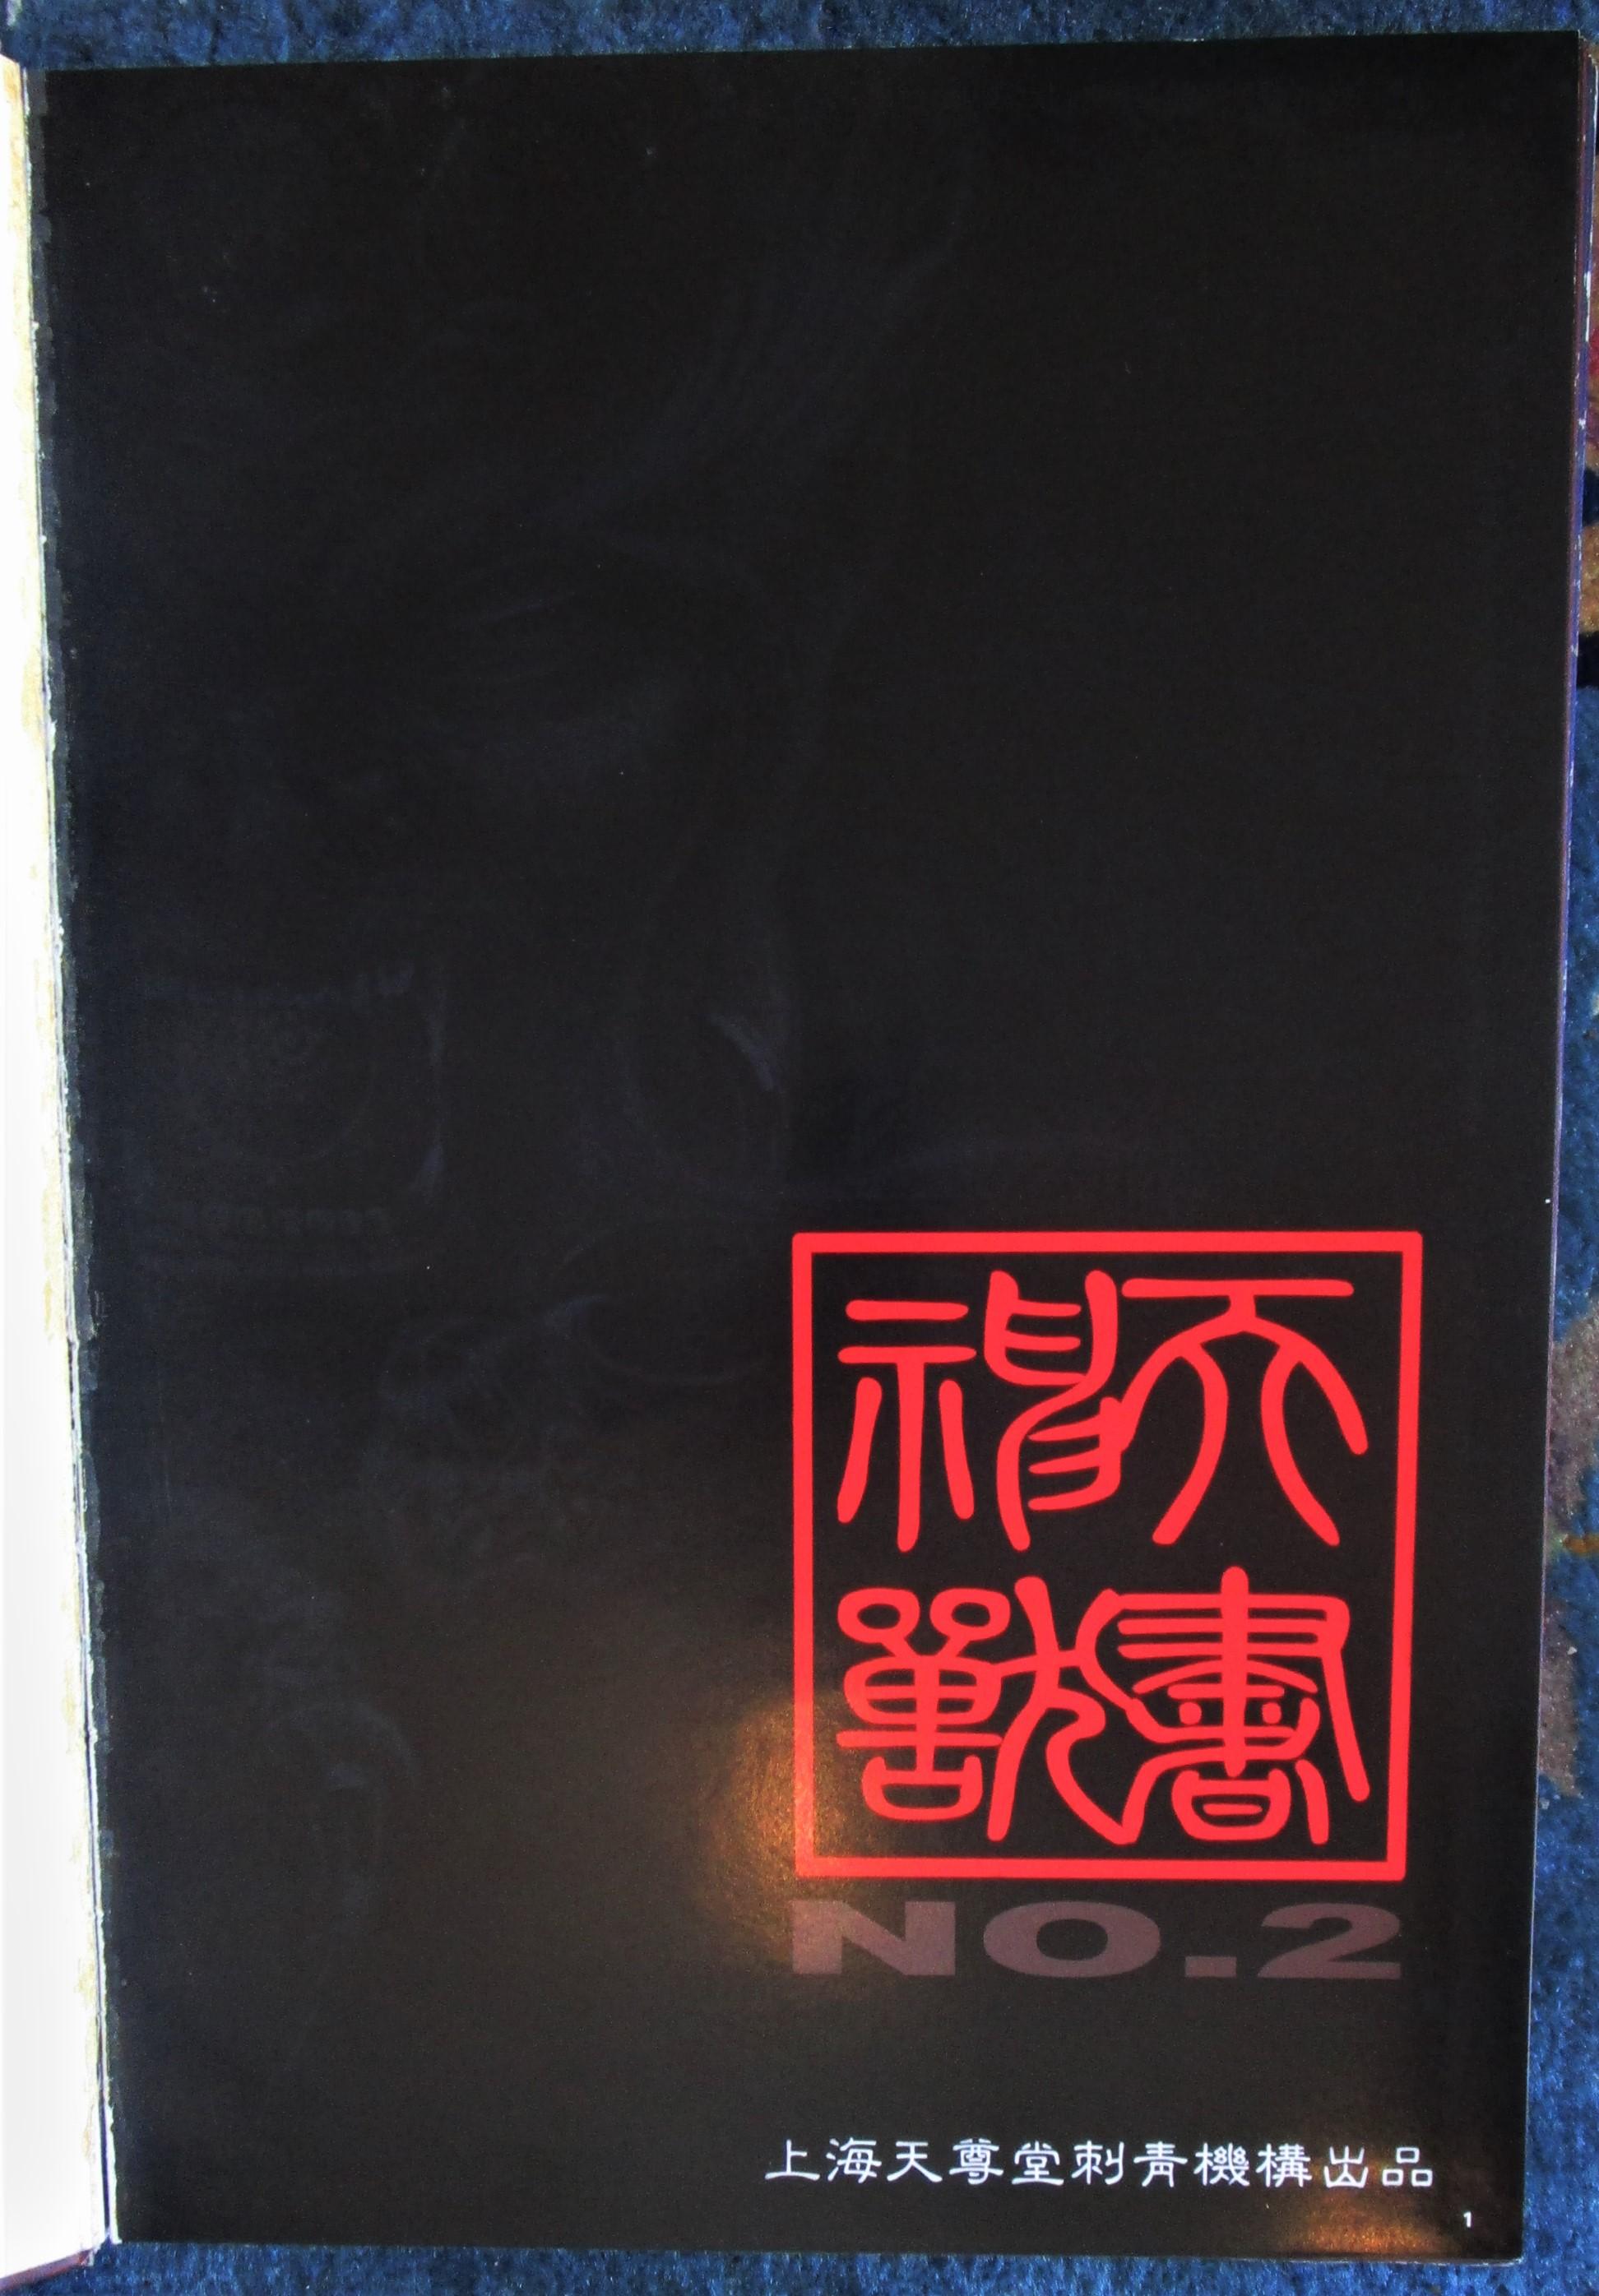 TIANZUN TANG TATTOO SHANGHAI CHINA - 2009